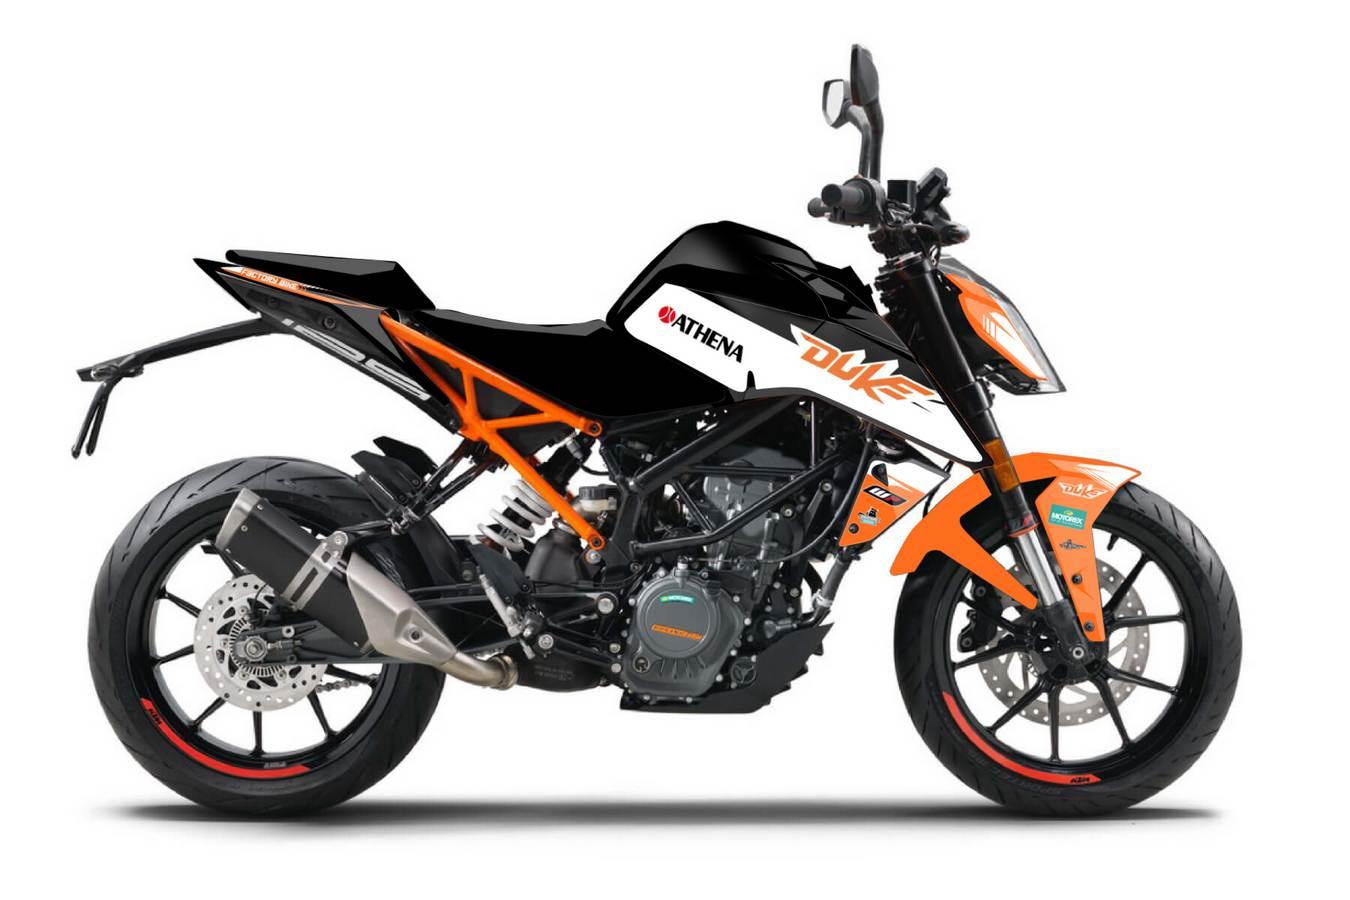 KTM Duke 125 200 390 2018 Aufkleber Satz orange schwarz weiss Dekor Kit Motorraddesign Dekoraufkleber Dekor design